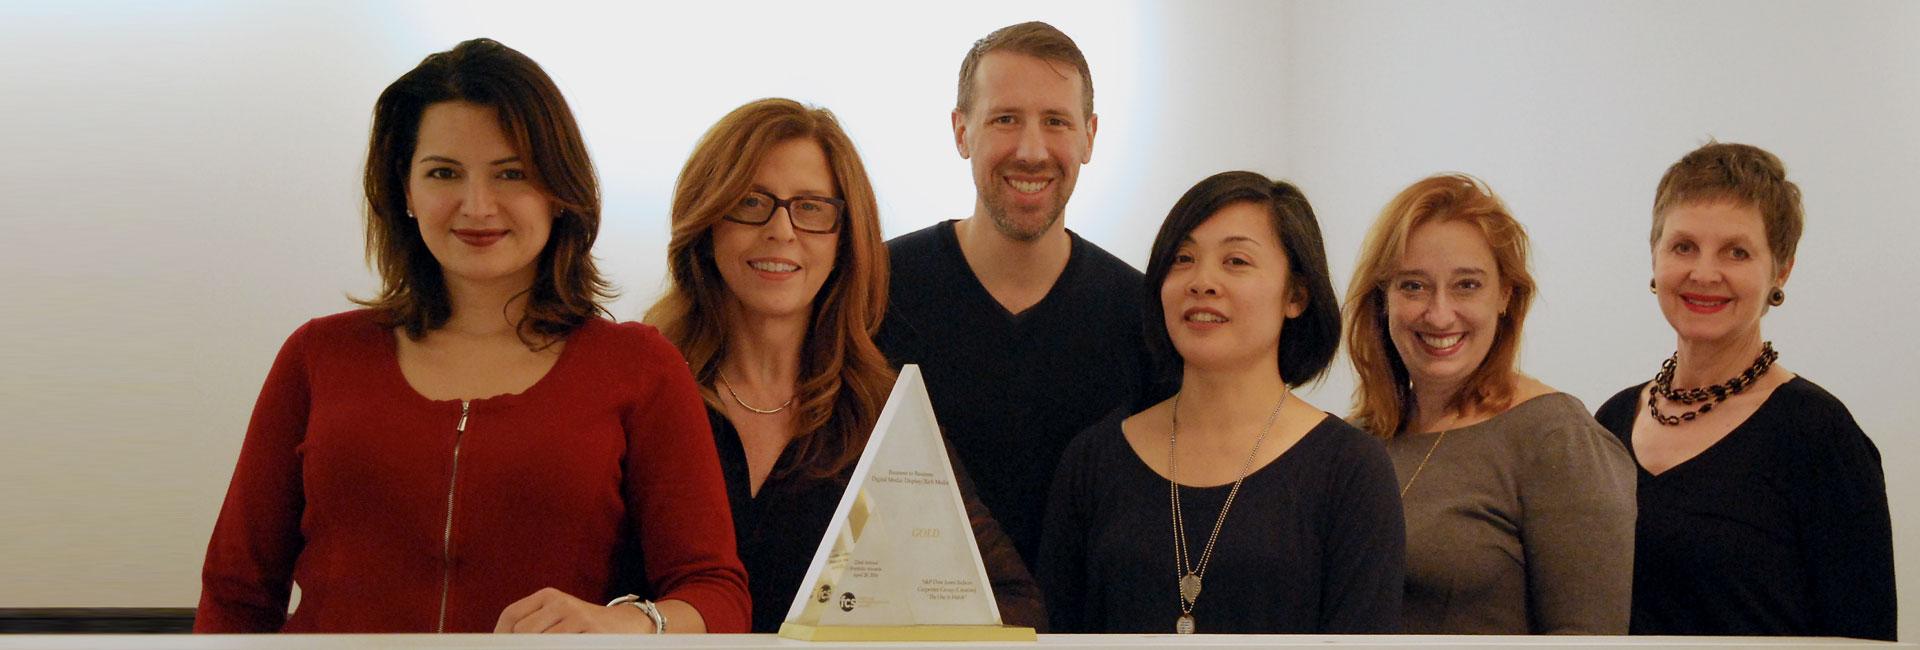 Our award-winning creative team.